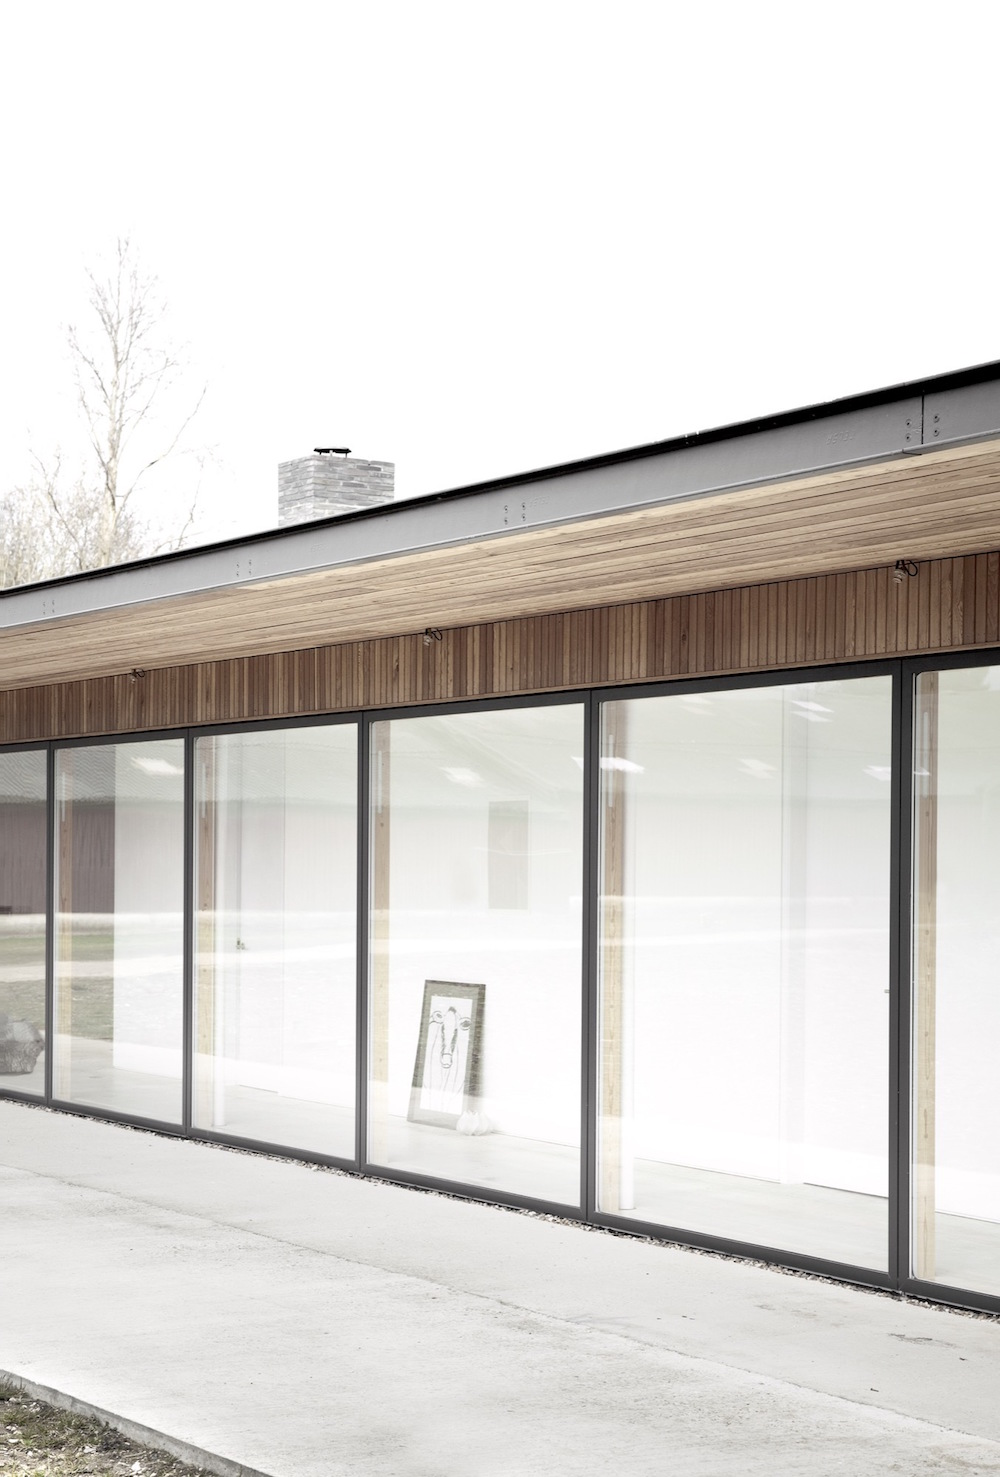 reydon-grove-farm-by-norm-architects-1